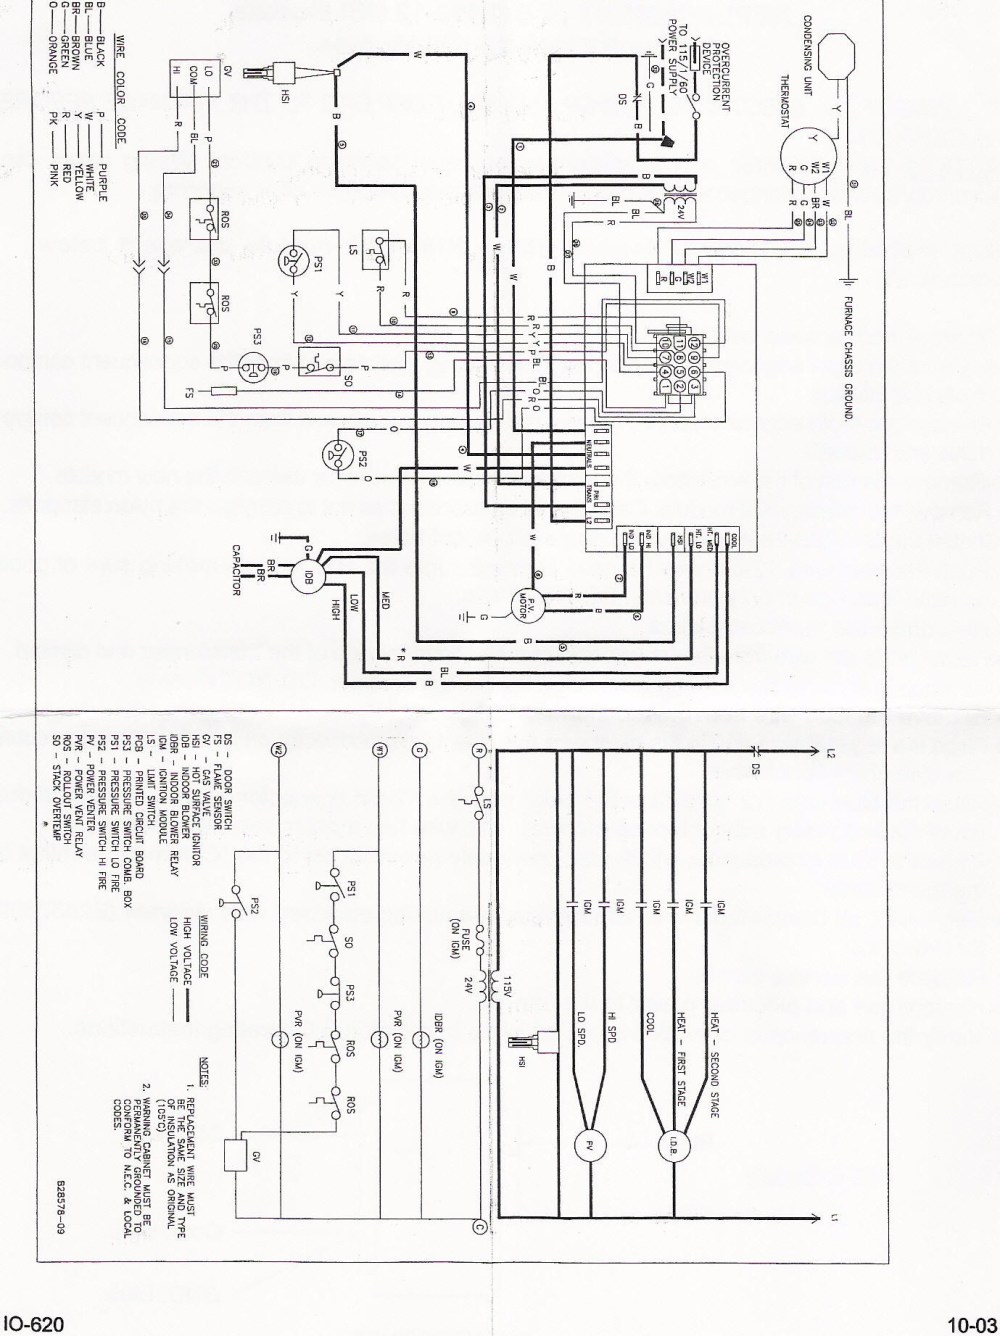 medium resolution of pump amana diagram wiring ptac heat wiring diagram amana hvac wiring diagrams